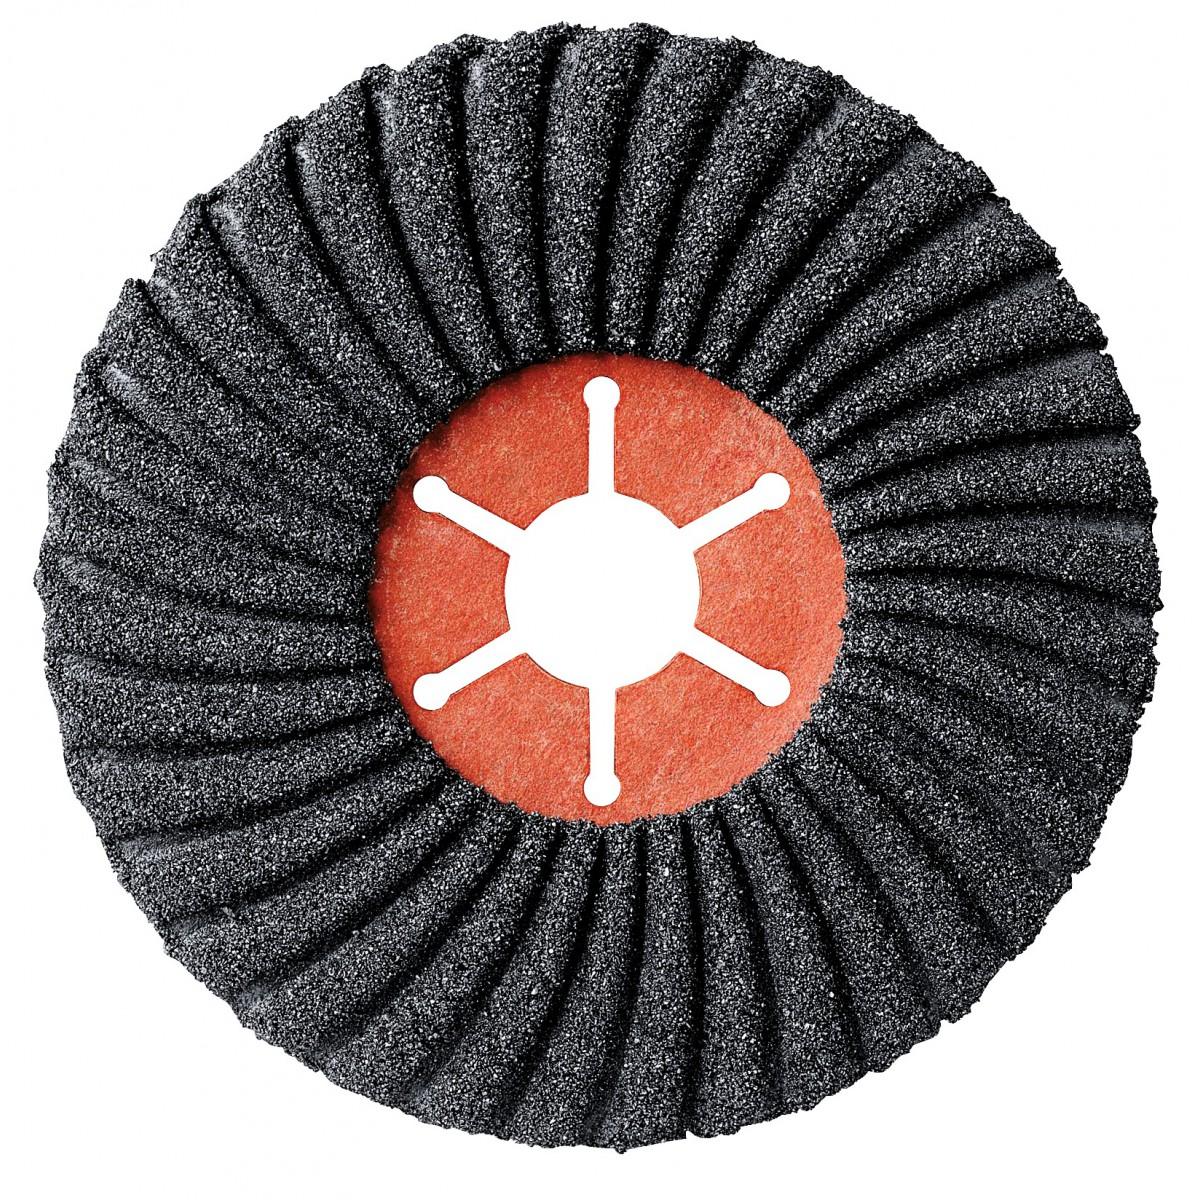 Disque semiflexible carbure de silicium diamètre 125 x 22 mm SCID - Grain 80